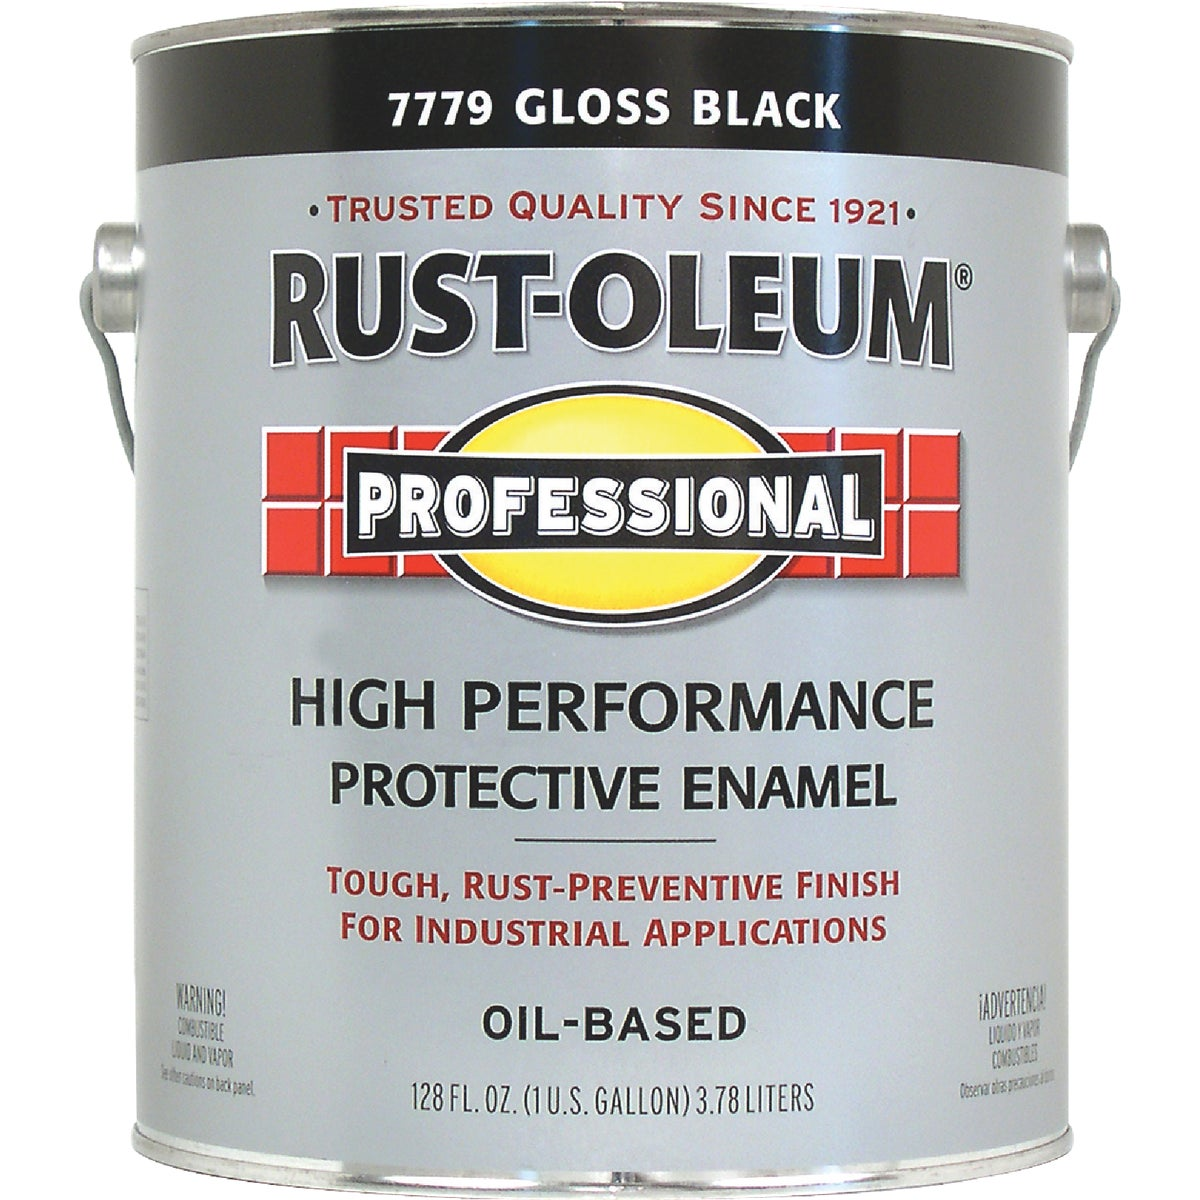 VOC BLACK PRO ENAMEL - K7779 by Rustoleum